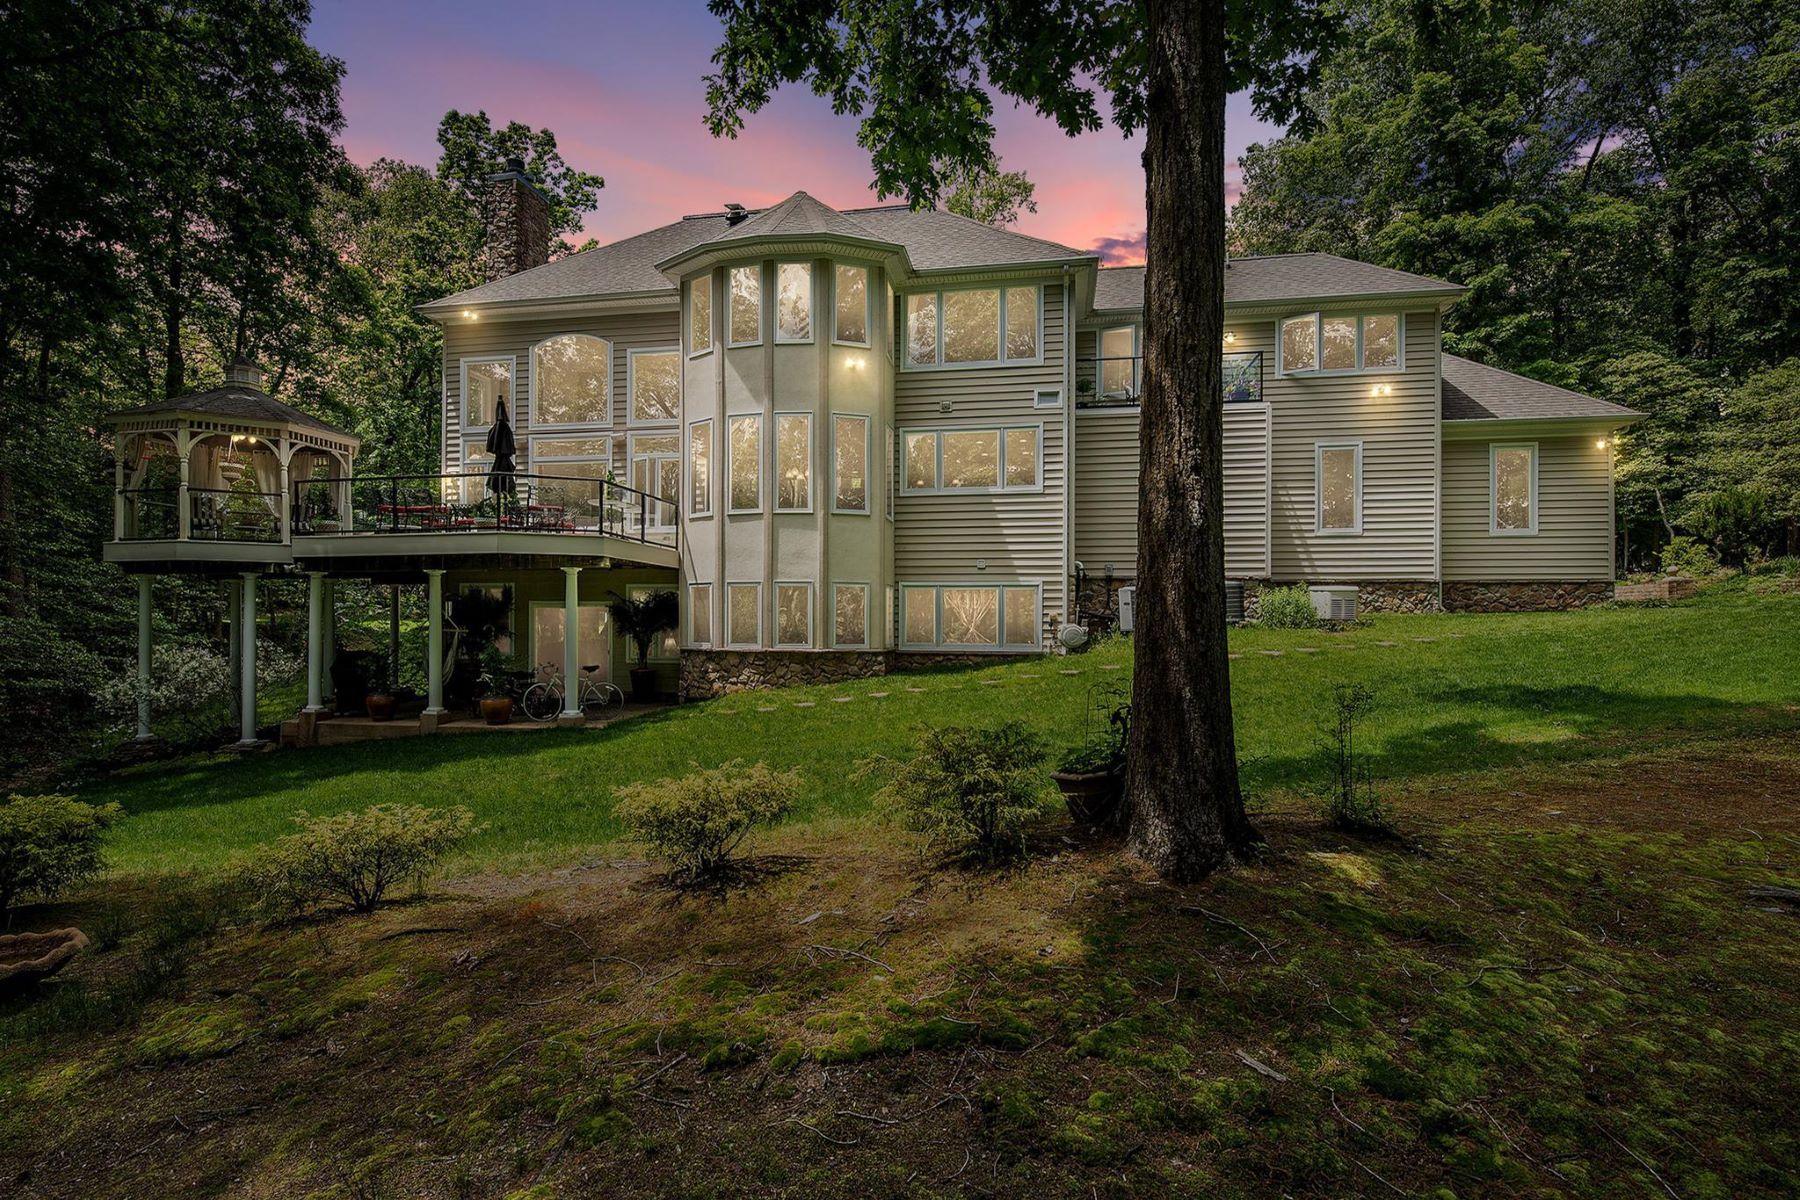 Single Family Homes for Active at 421 Shady Ln Pasadena, Maryland 21122 United States